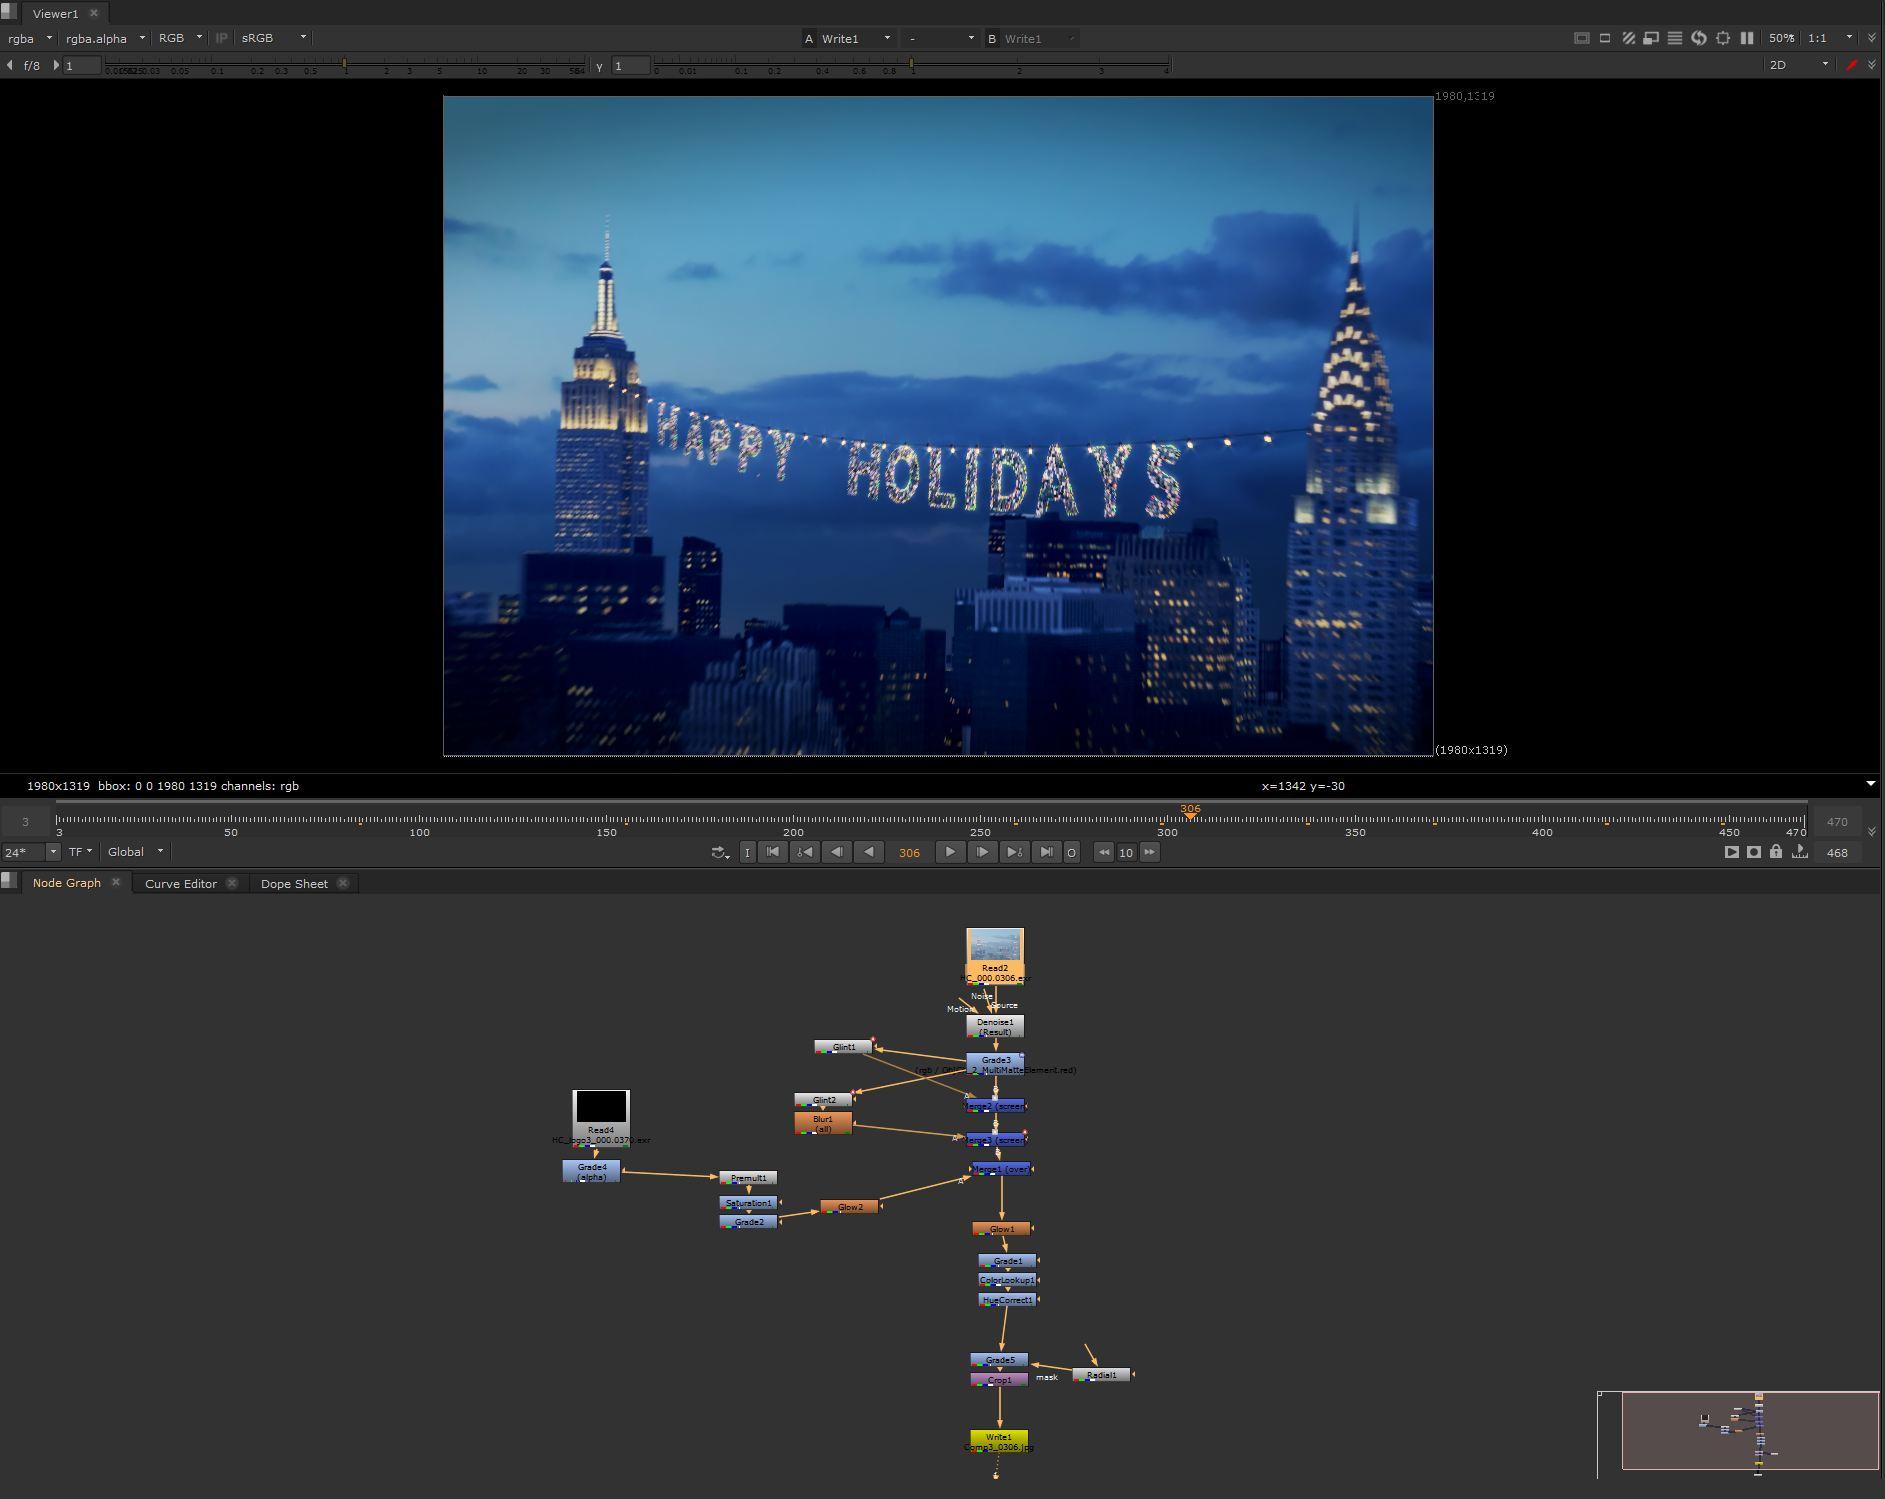 MOSO Studio Holiday card 2016 nuke